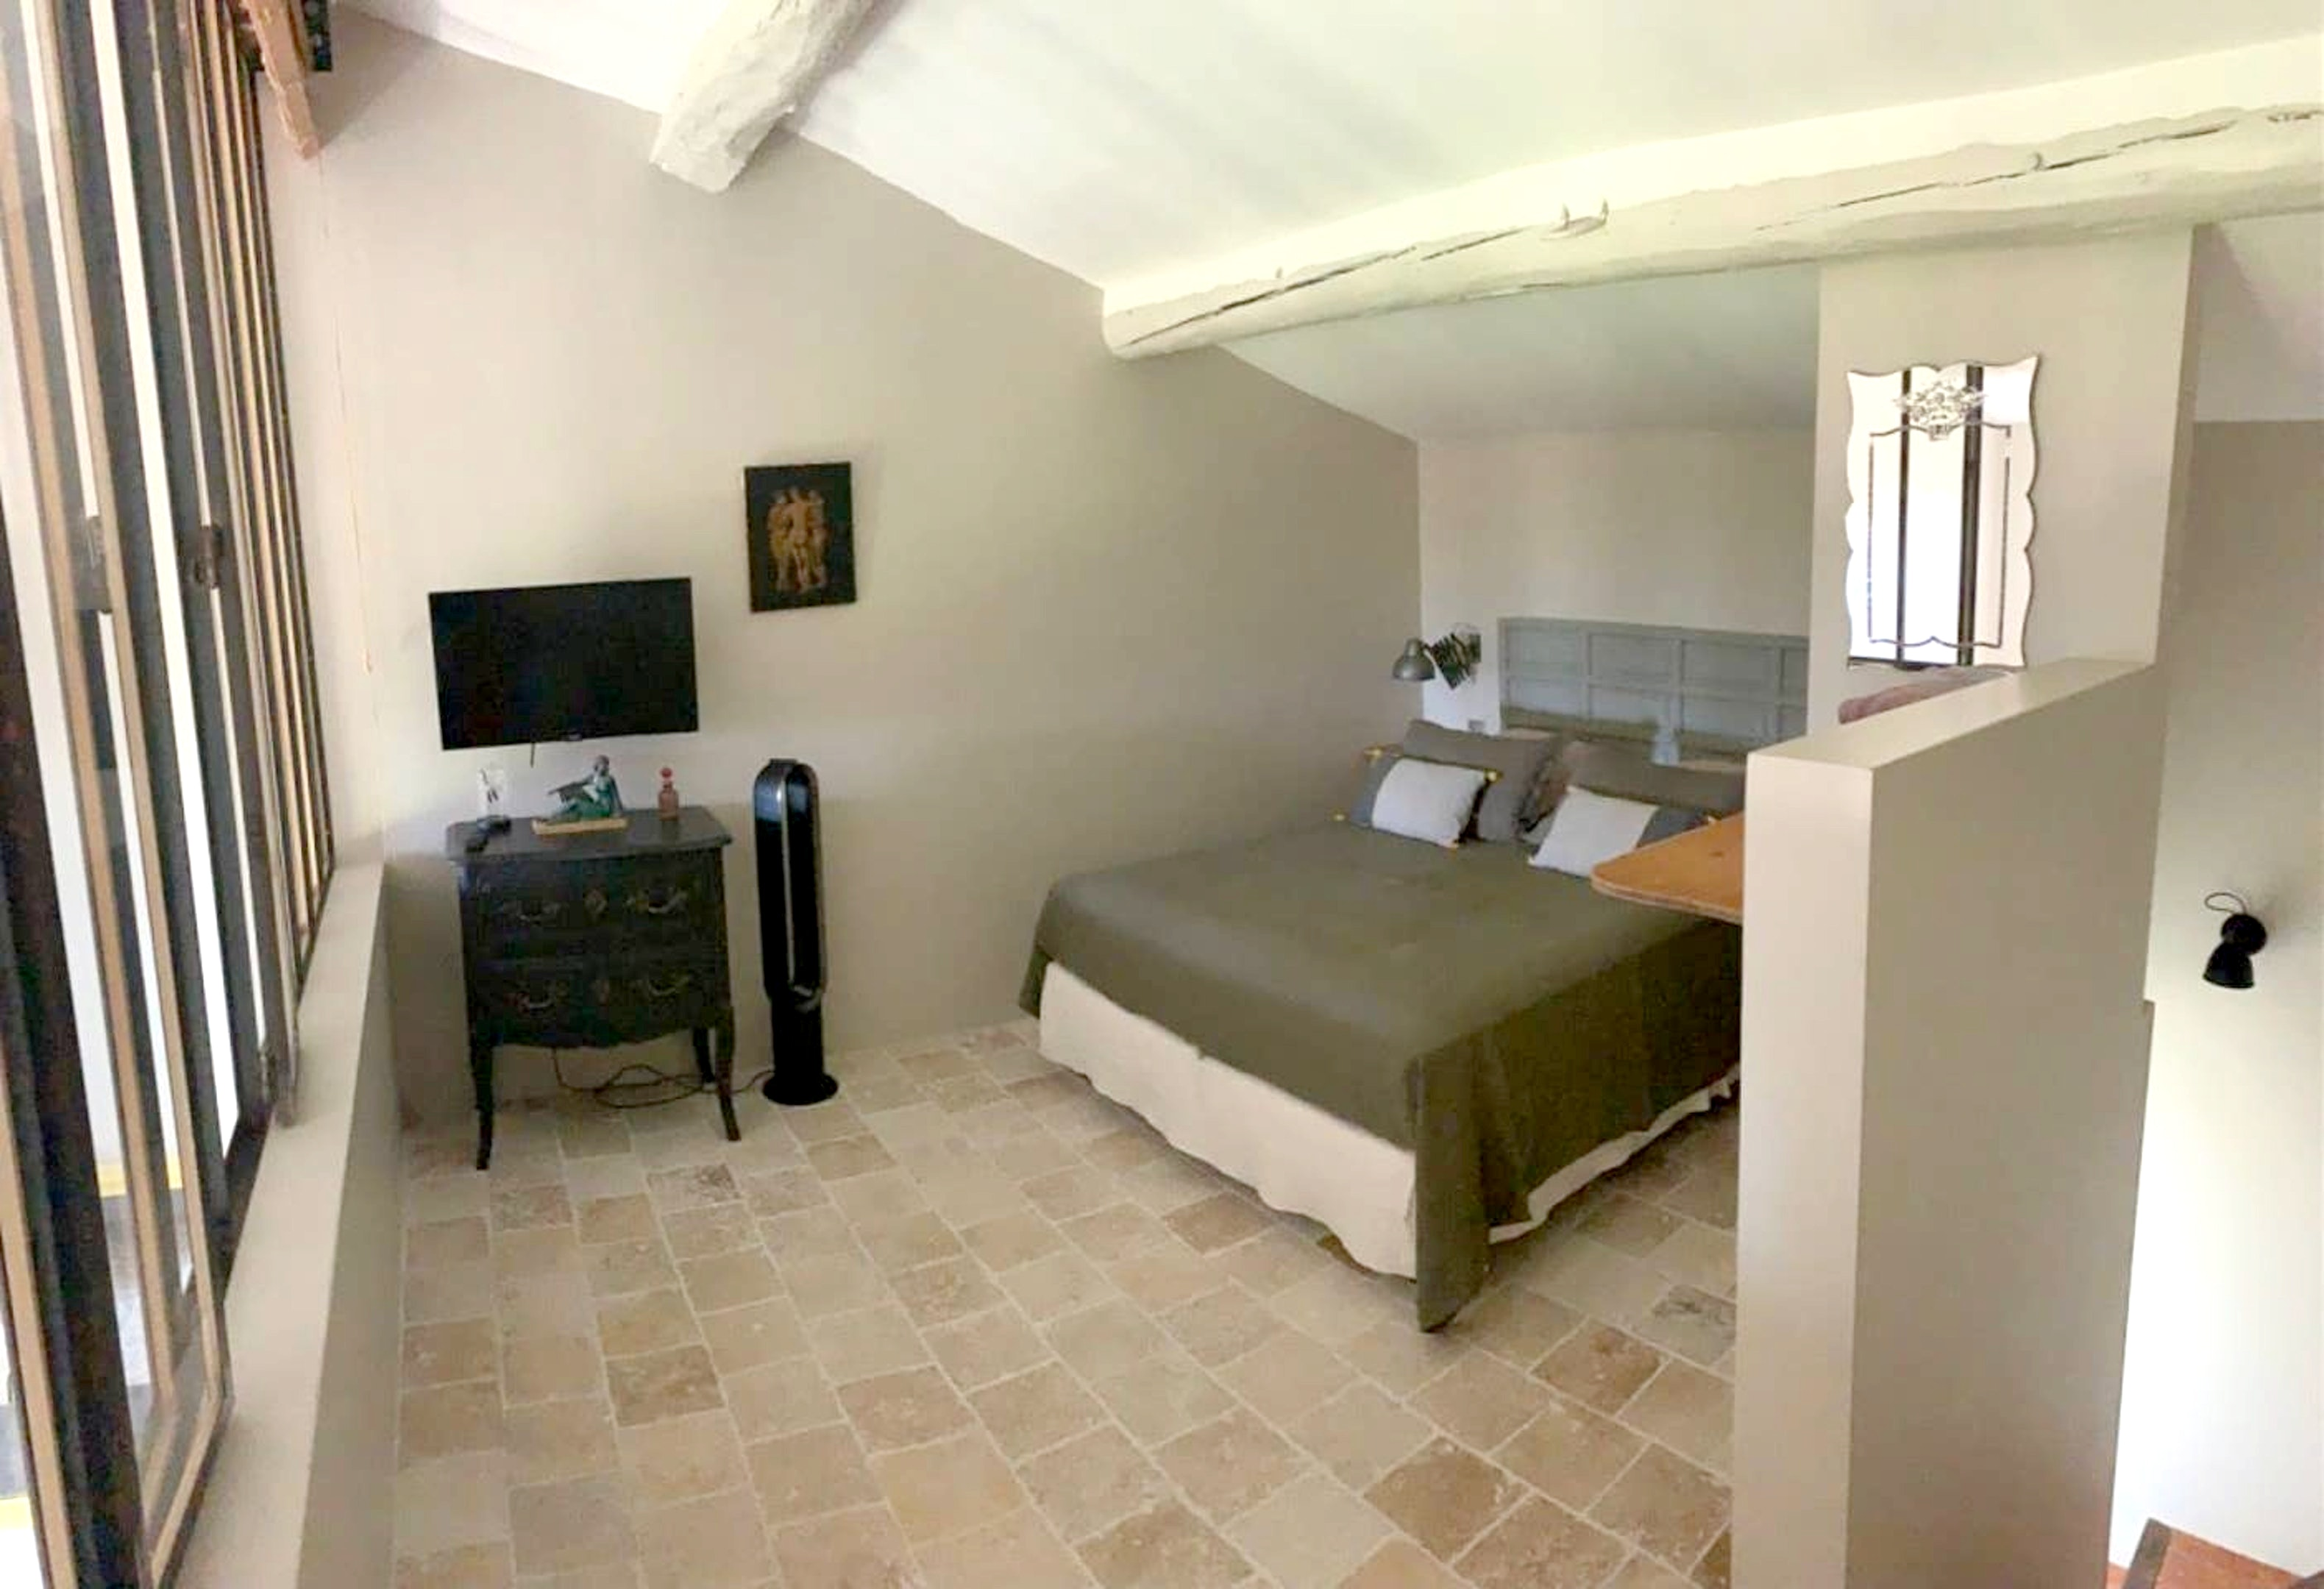 Holiday house Haus mit 2 Schlafzimmern in Roussillon mit Pool, eingezäuntem Garten und W-LAN (2818064), Roussillon, Vaucluse, Provence - Alps - Côte d'Azur, France, picture 5